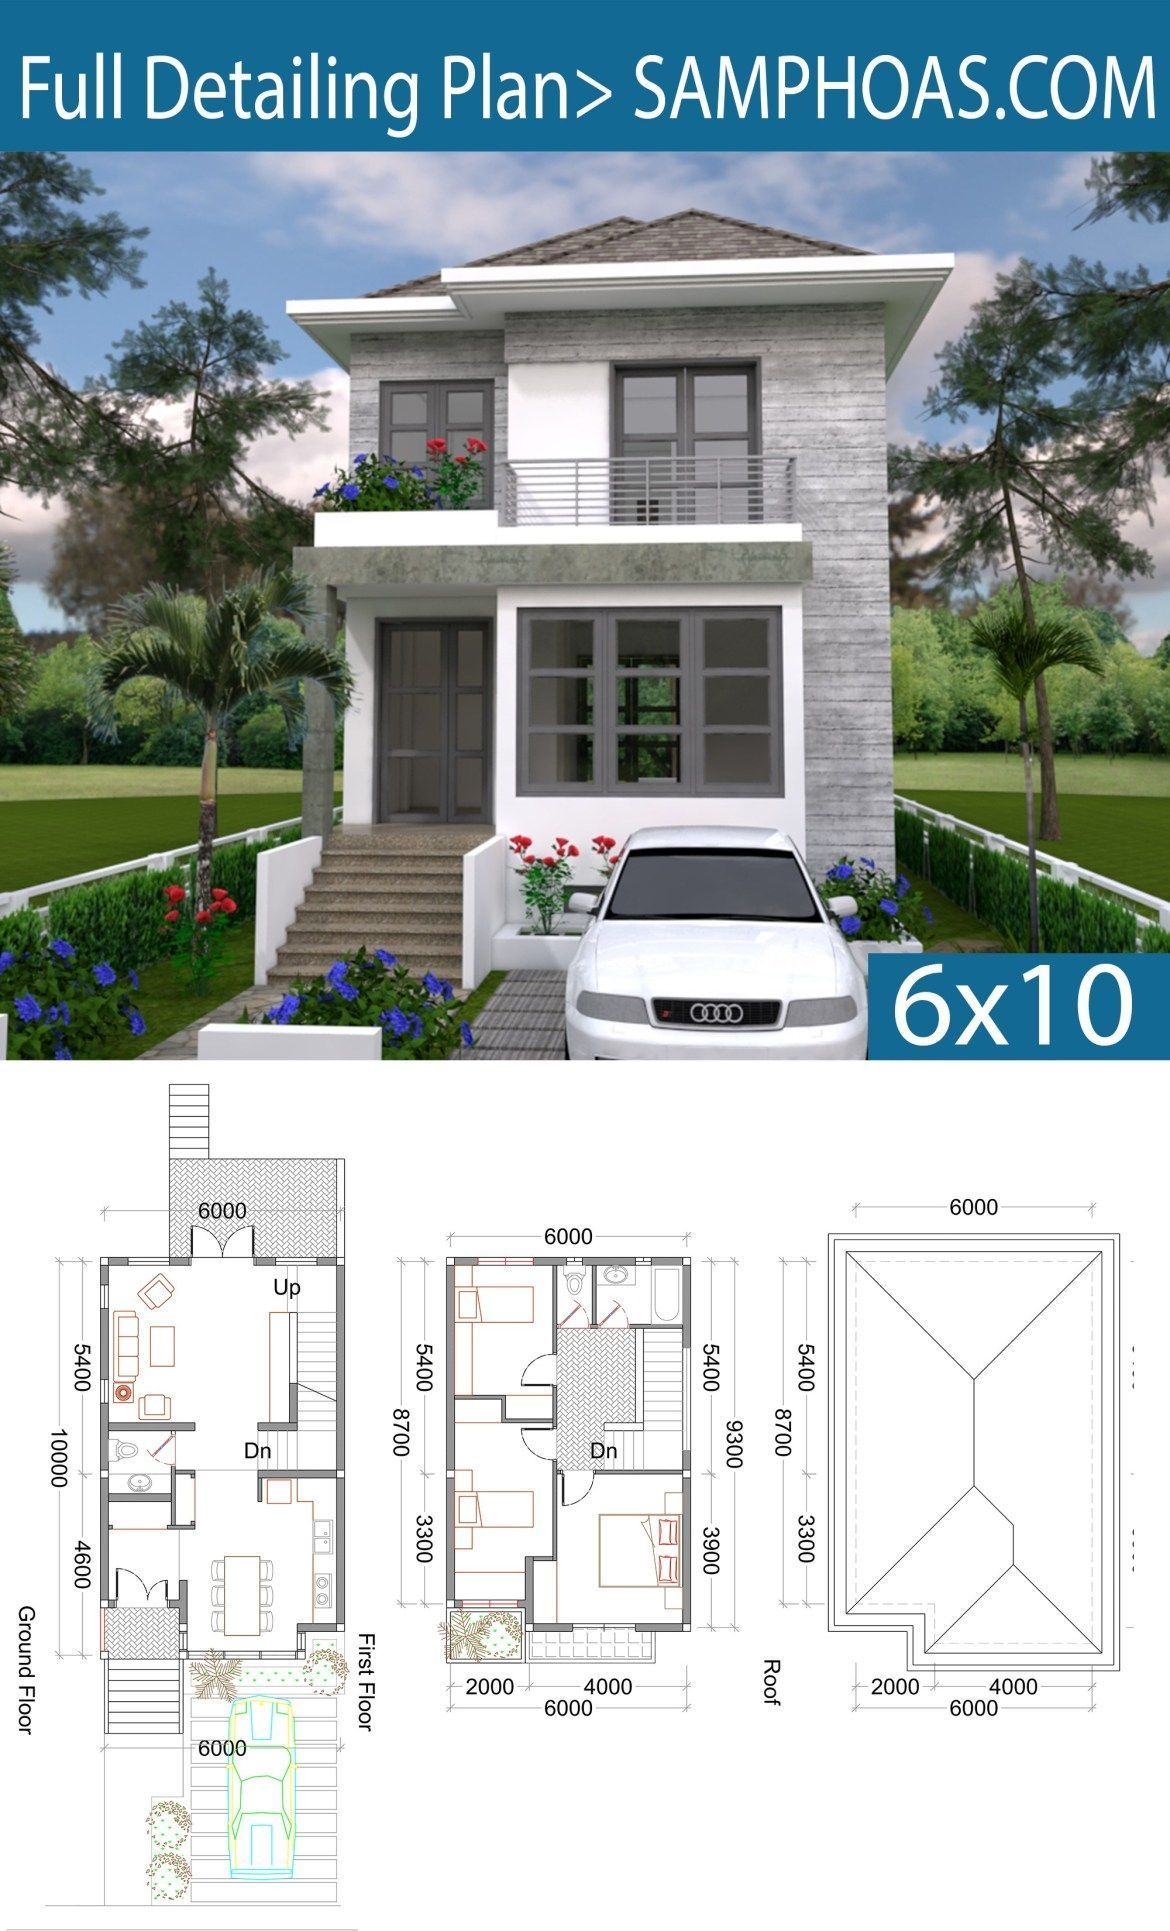 3 Bedrooms Small Home Design Plan 6x10m Samphoas Plansearch Casaspequenas Small House Design Plans Modern House Plans Architectural House Plans